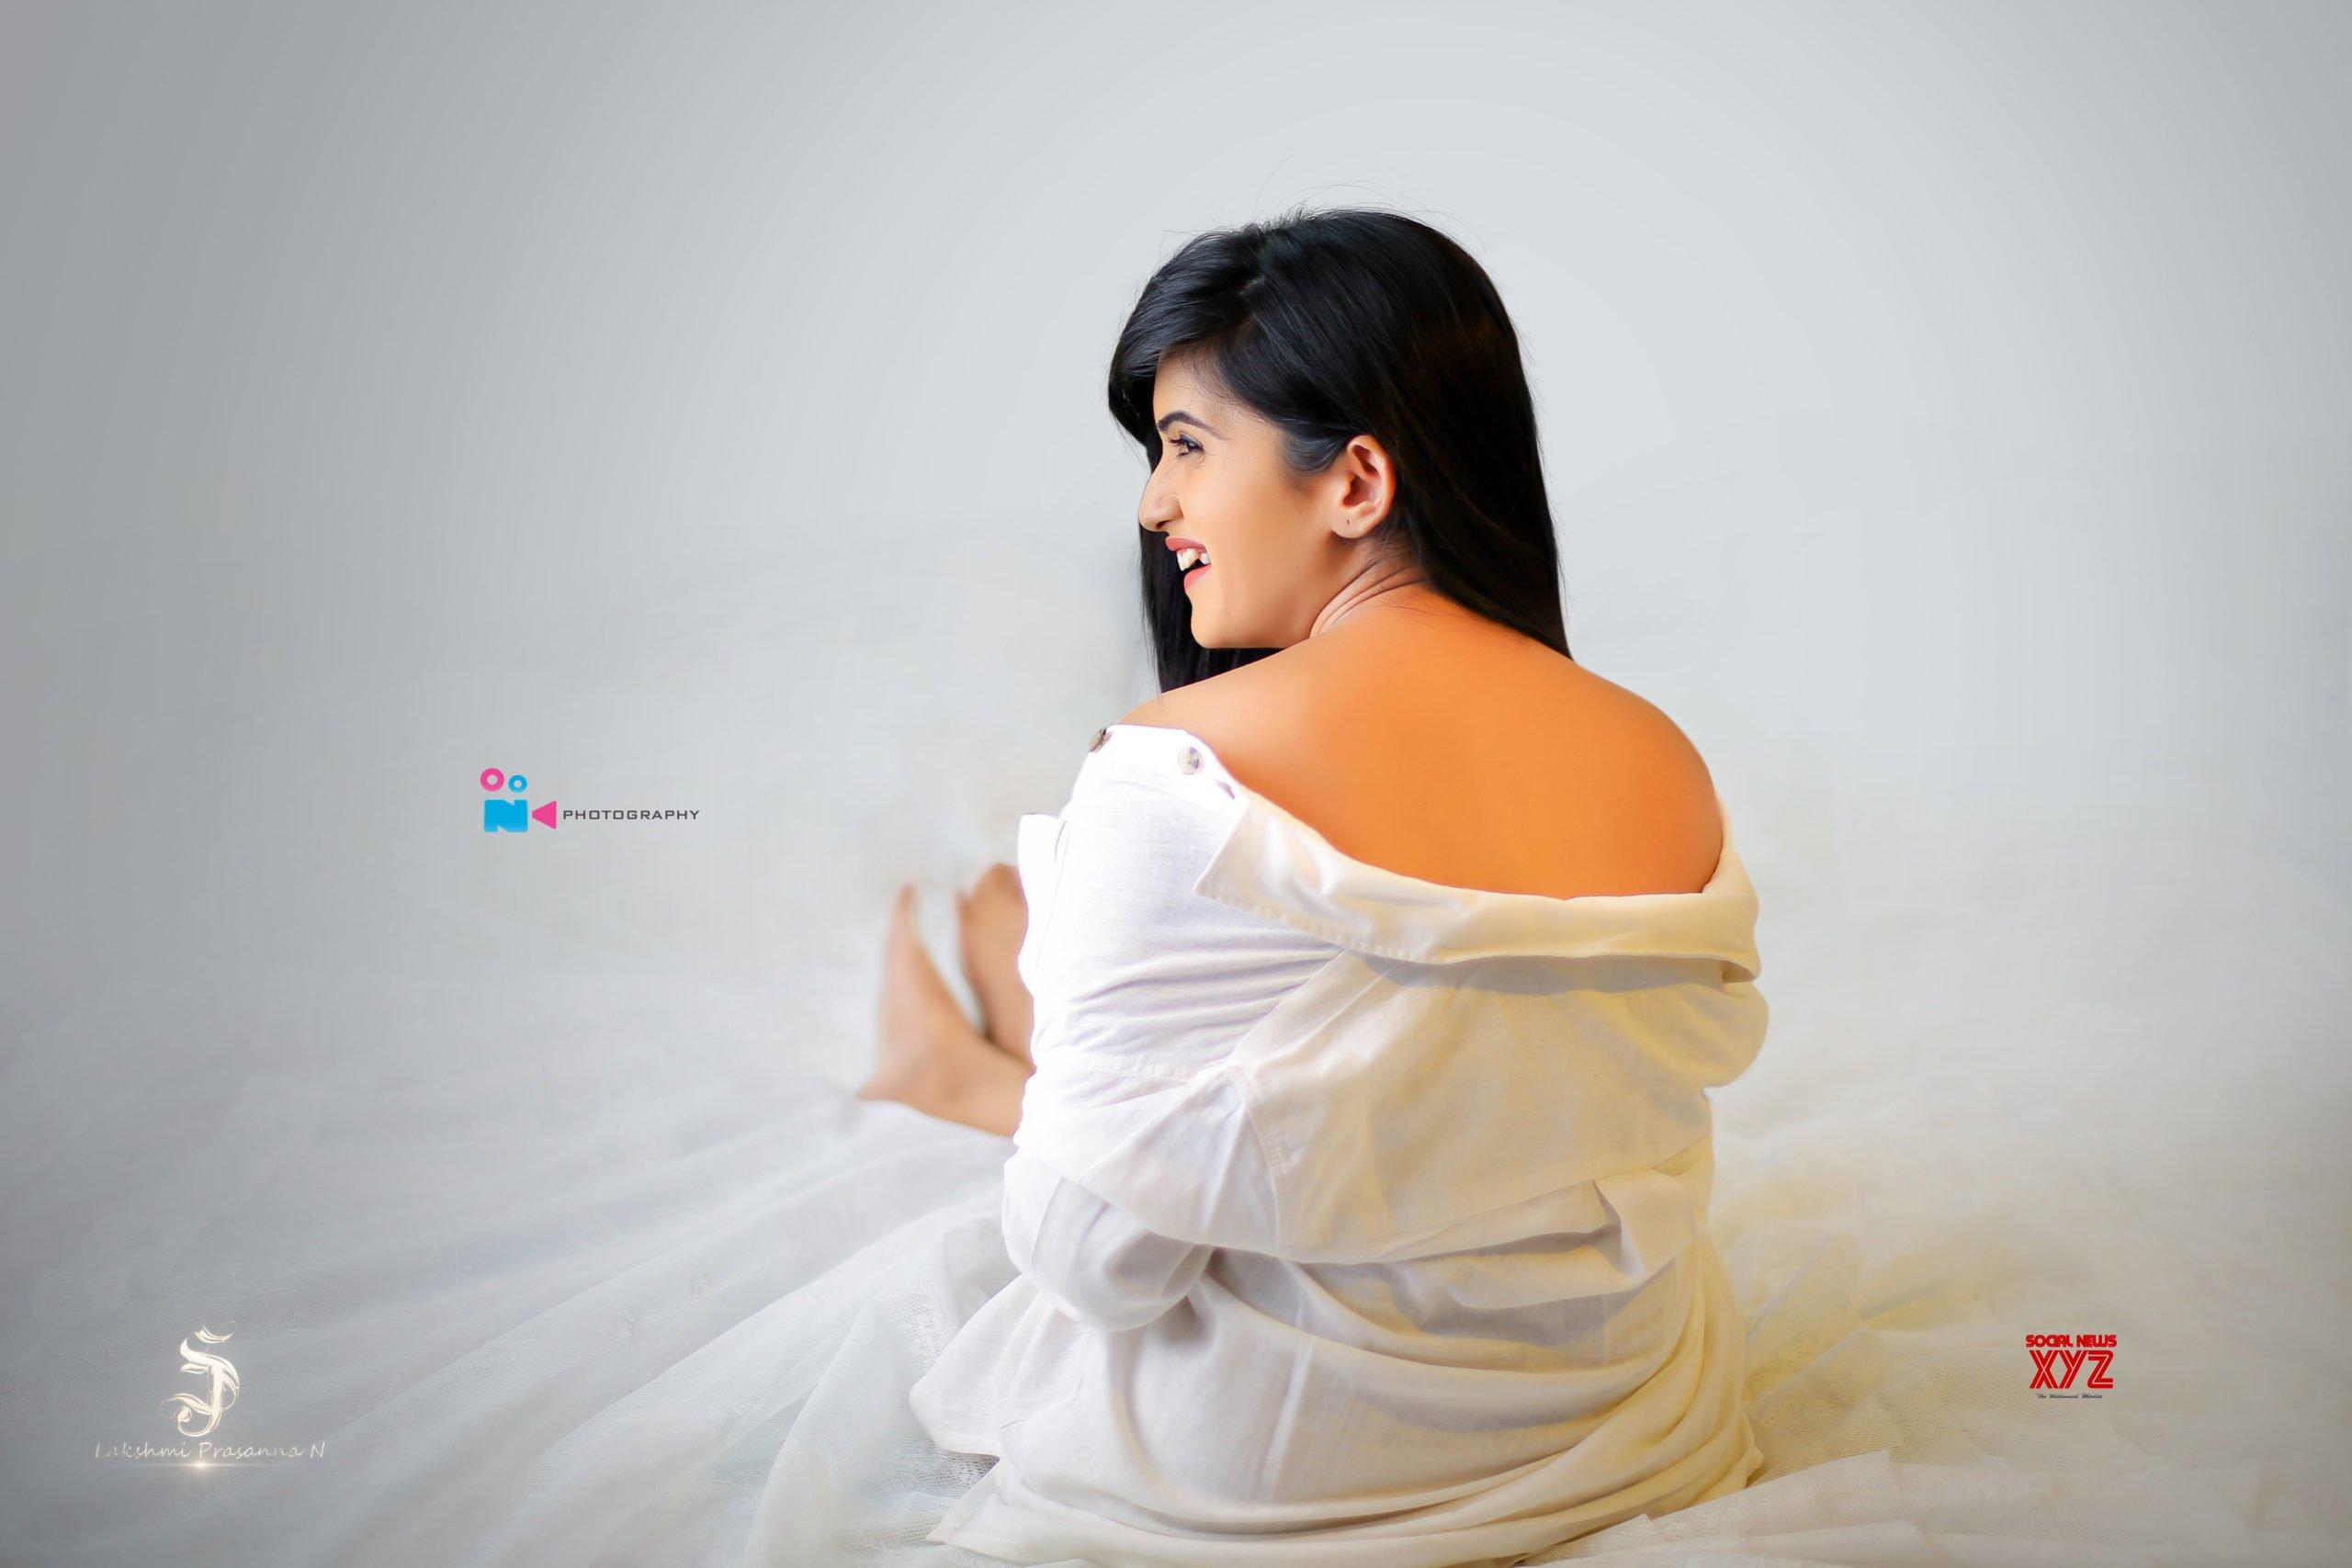 Anchor Sravanthi Chokkarapu Stills From Hot Photoshoot